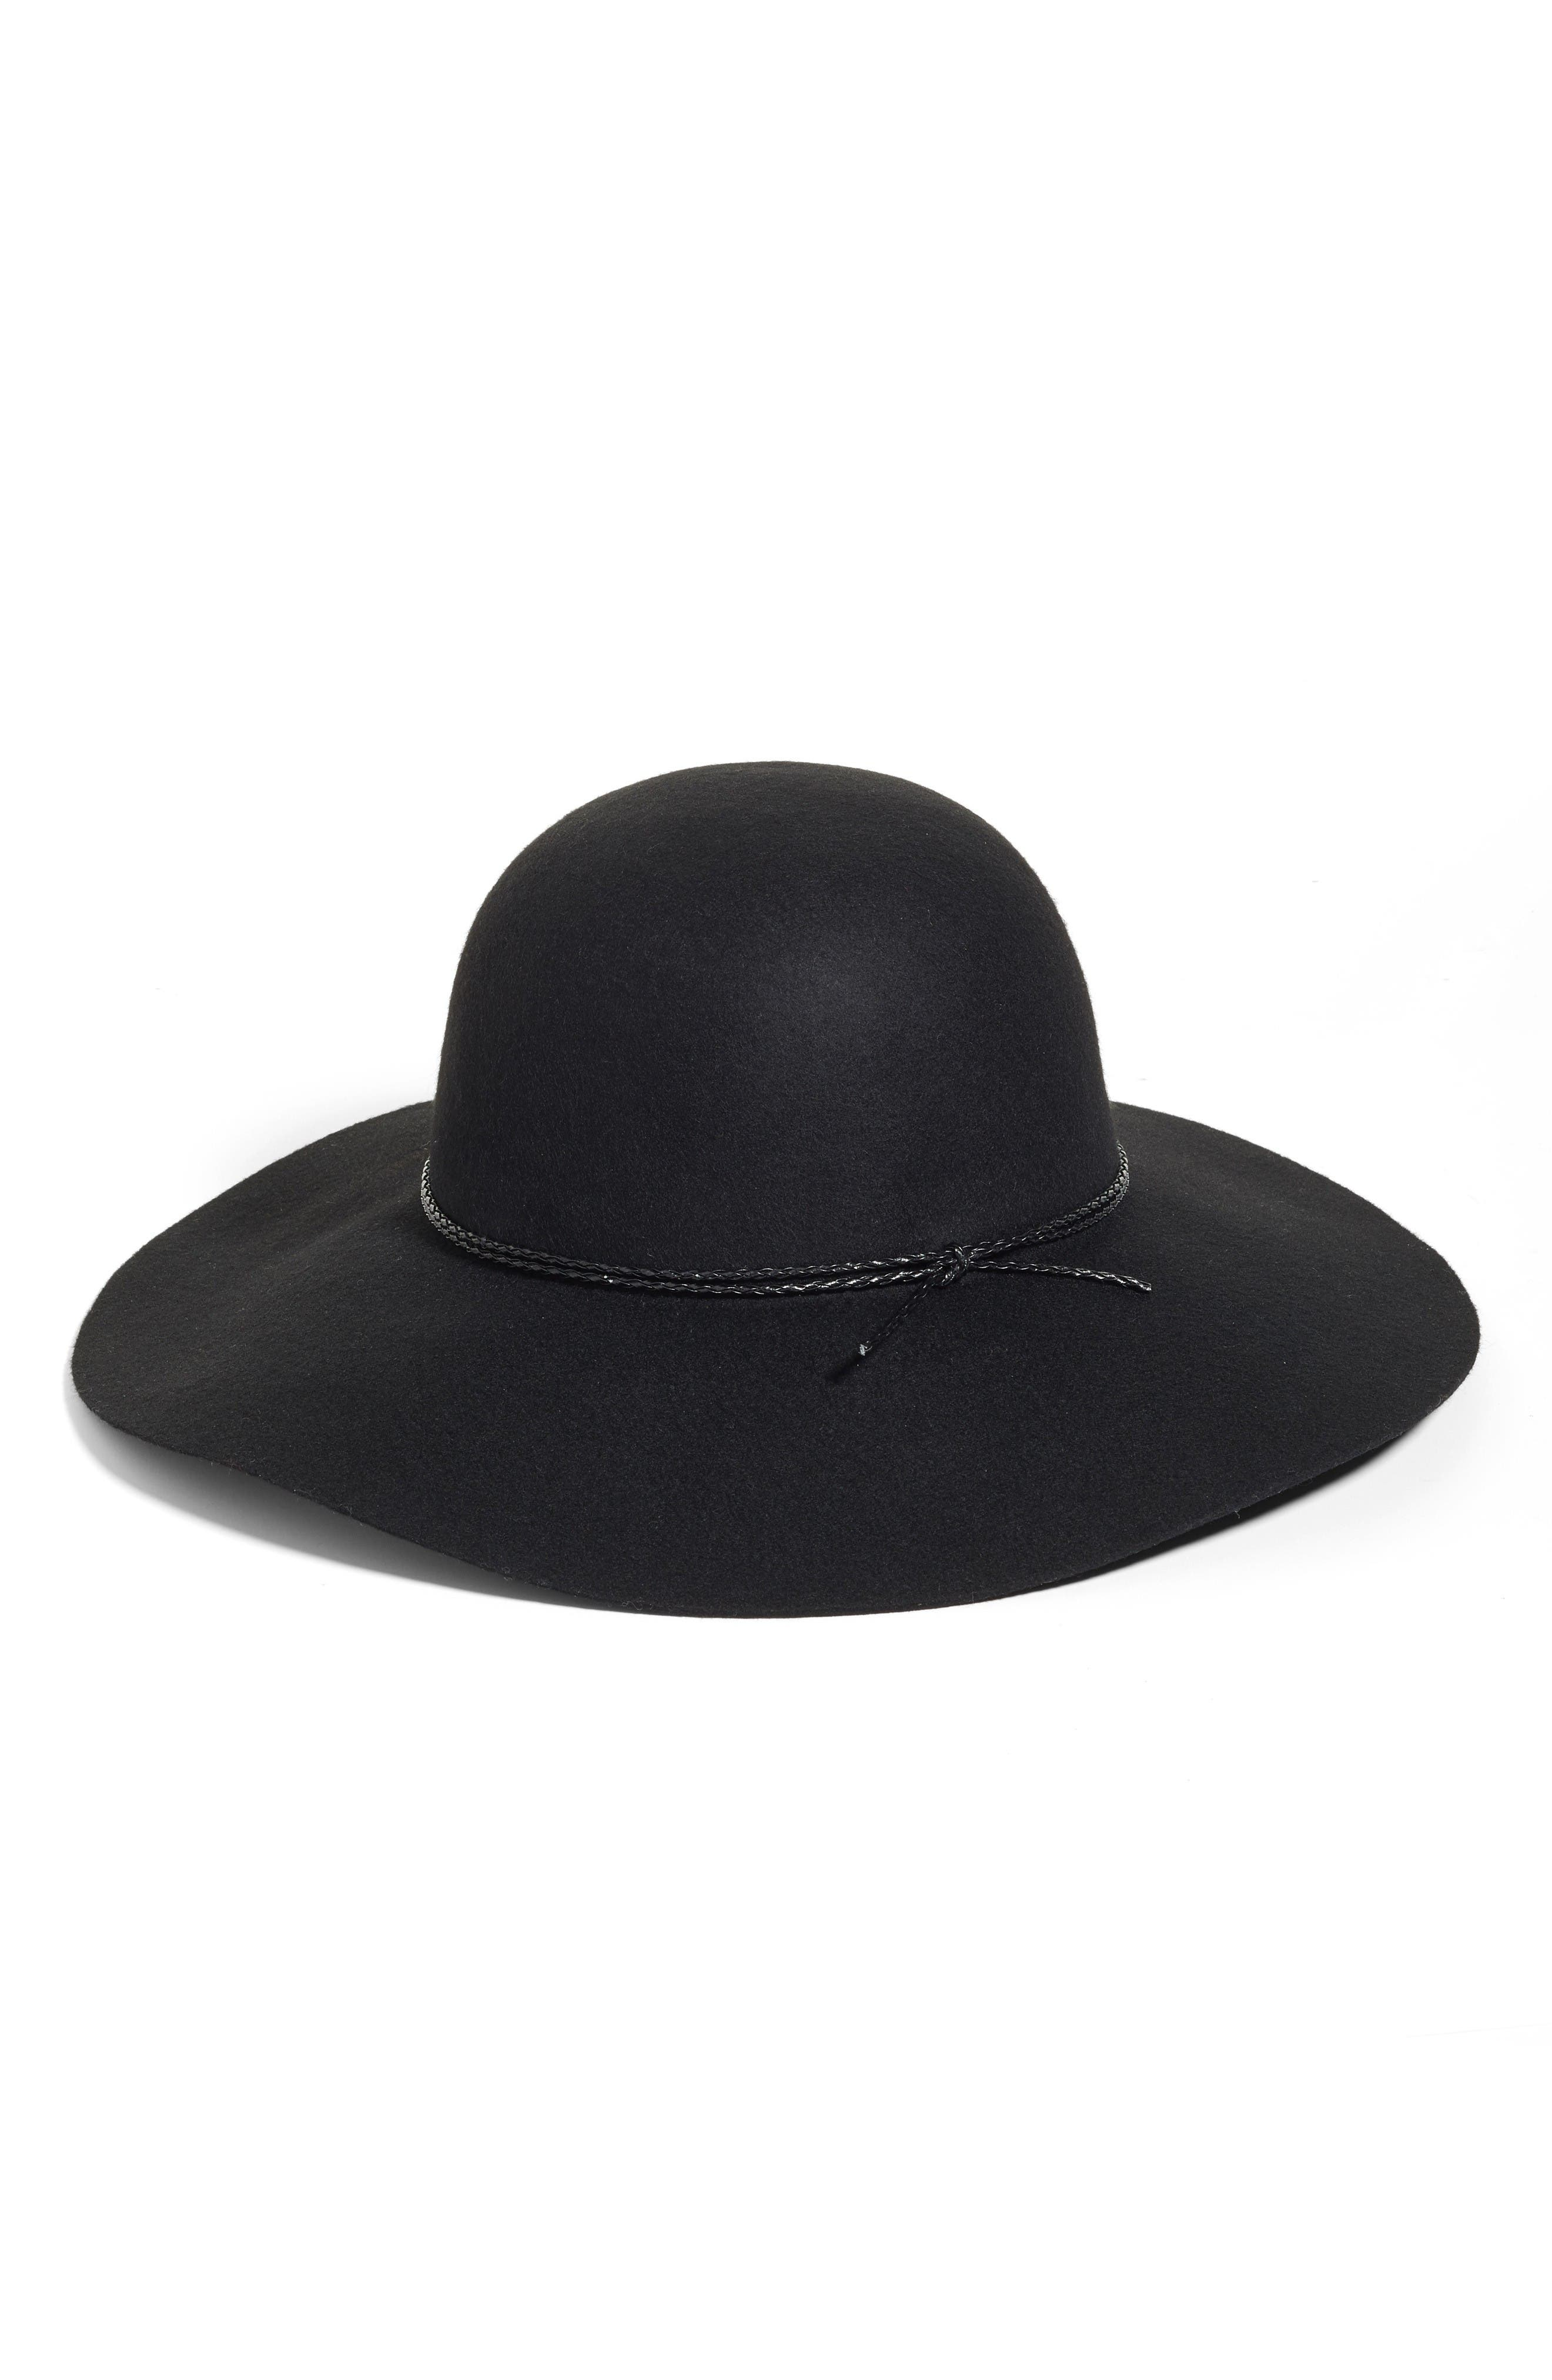 Alternate Image 1 Selected - Halogen® Wool Floppy Hat